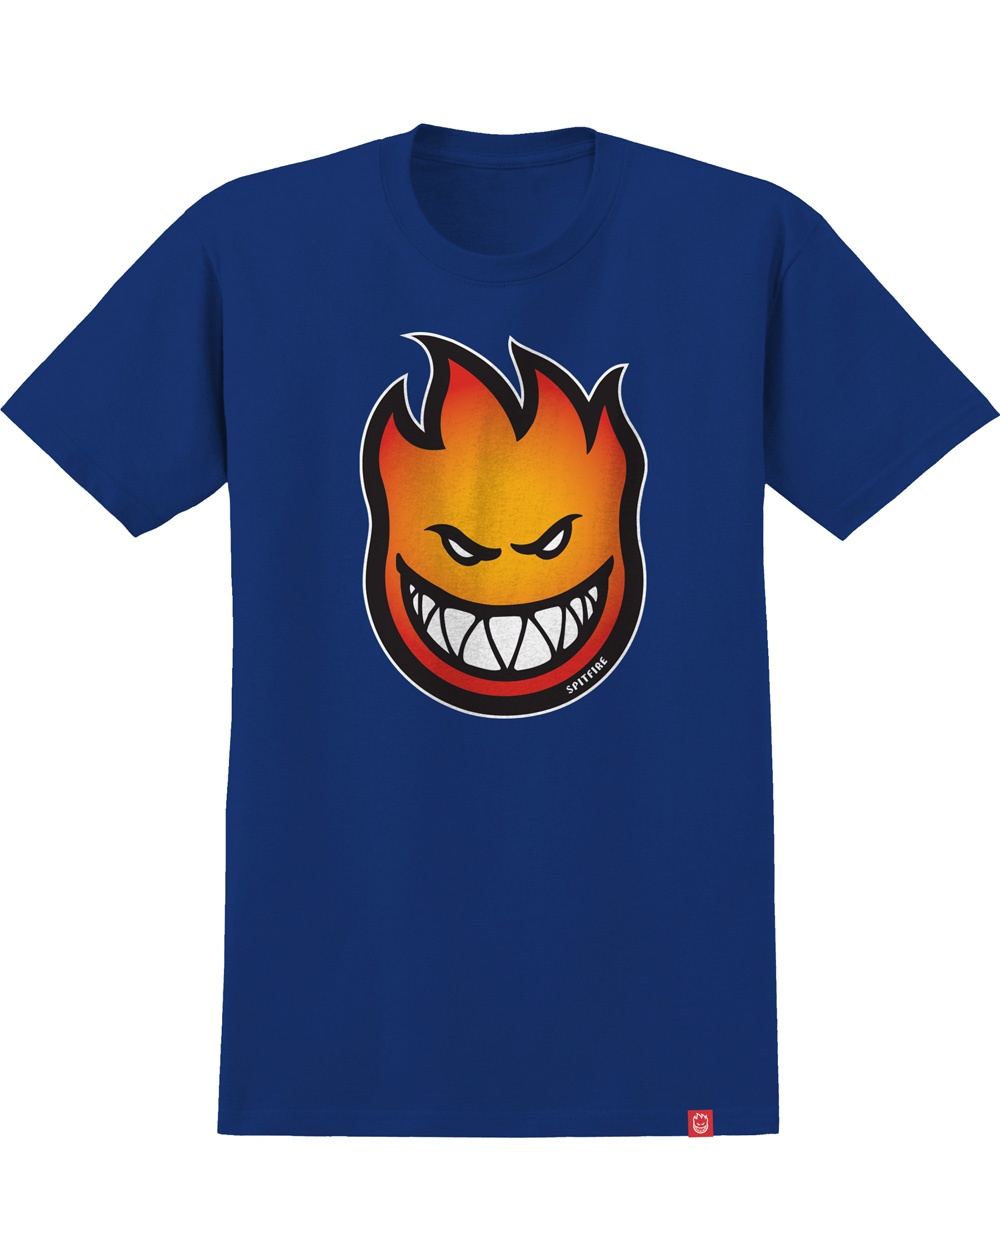 Spitfire Men's T-Shirt Bighead Fade Fill Royal